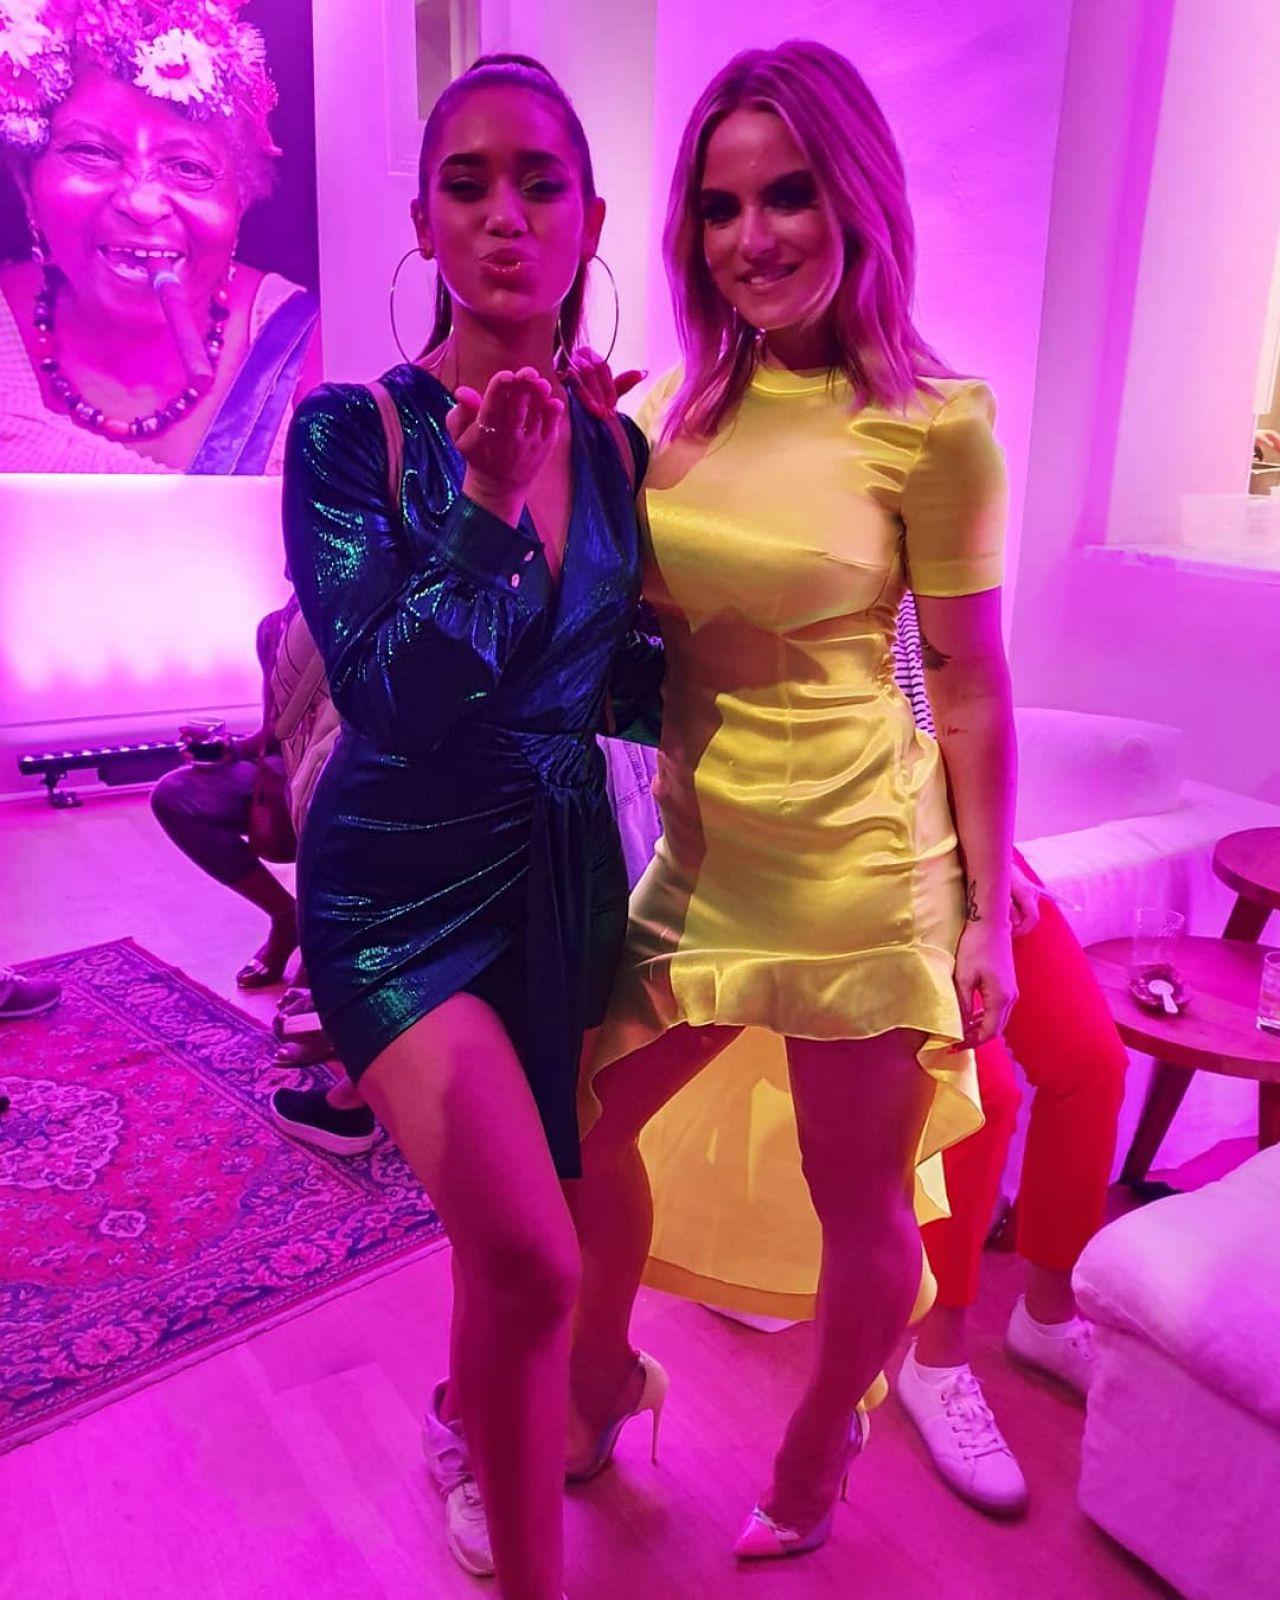 Joanna JoJo Levesque - Social Media 07/08/2019